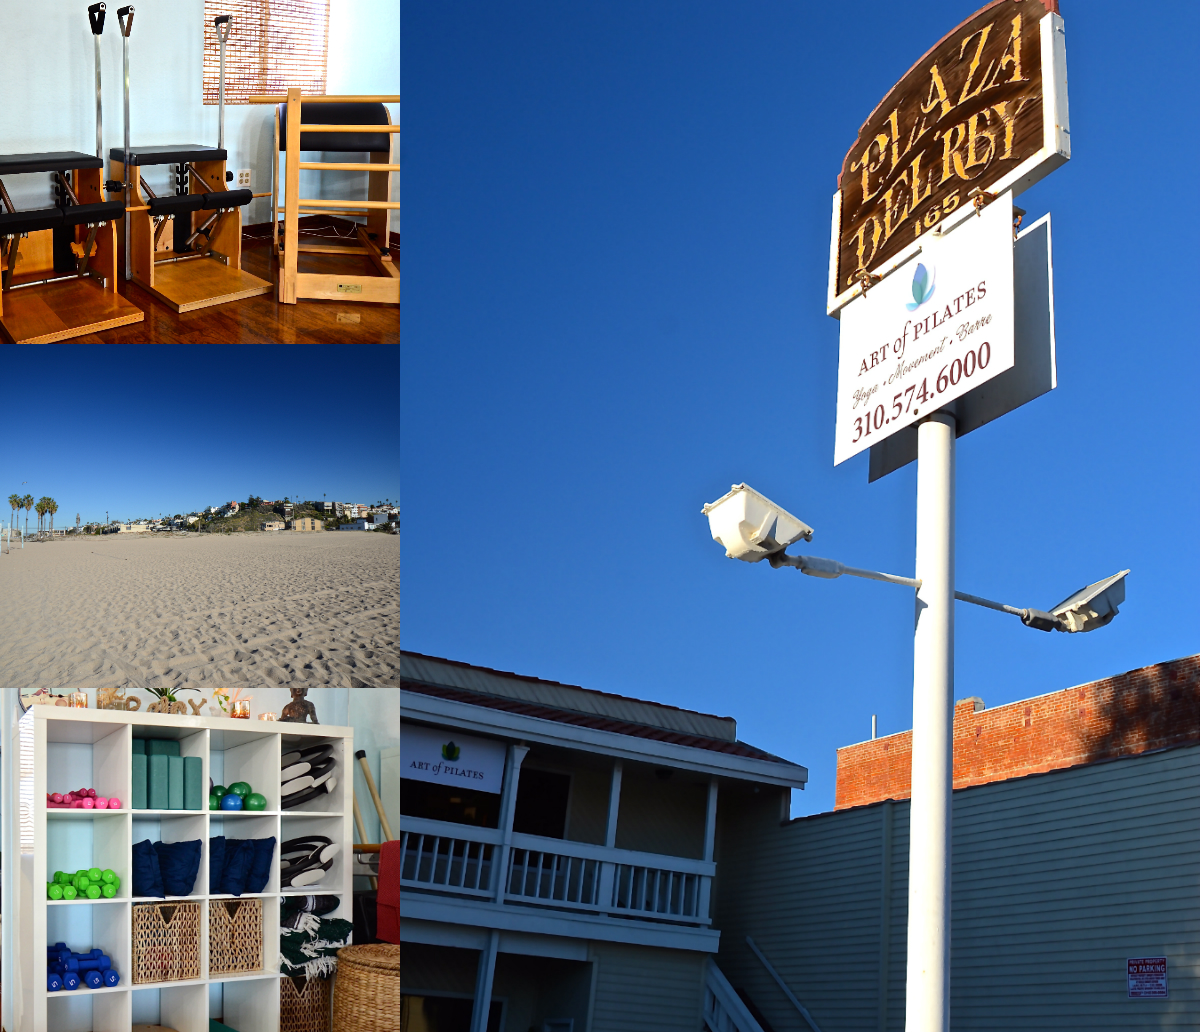 Art of Pilates collage | Art of Pilates | Playa del Rey, CA